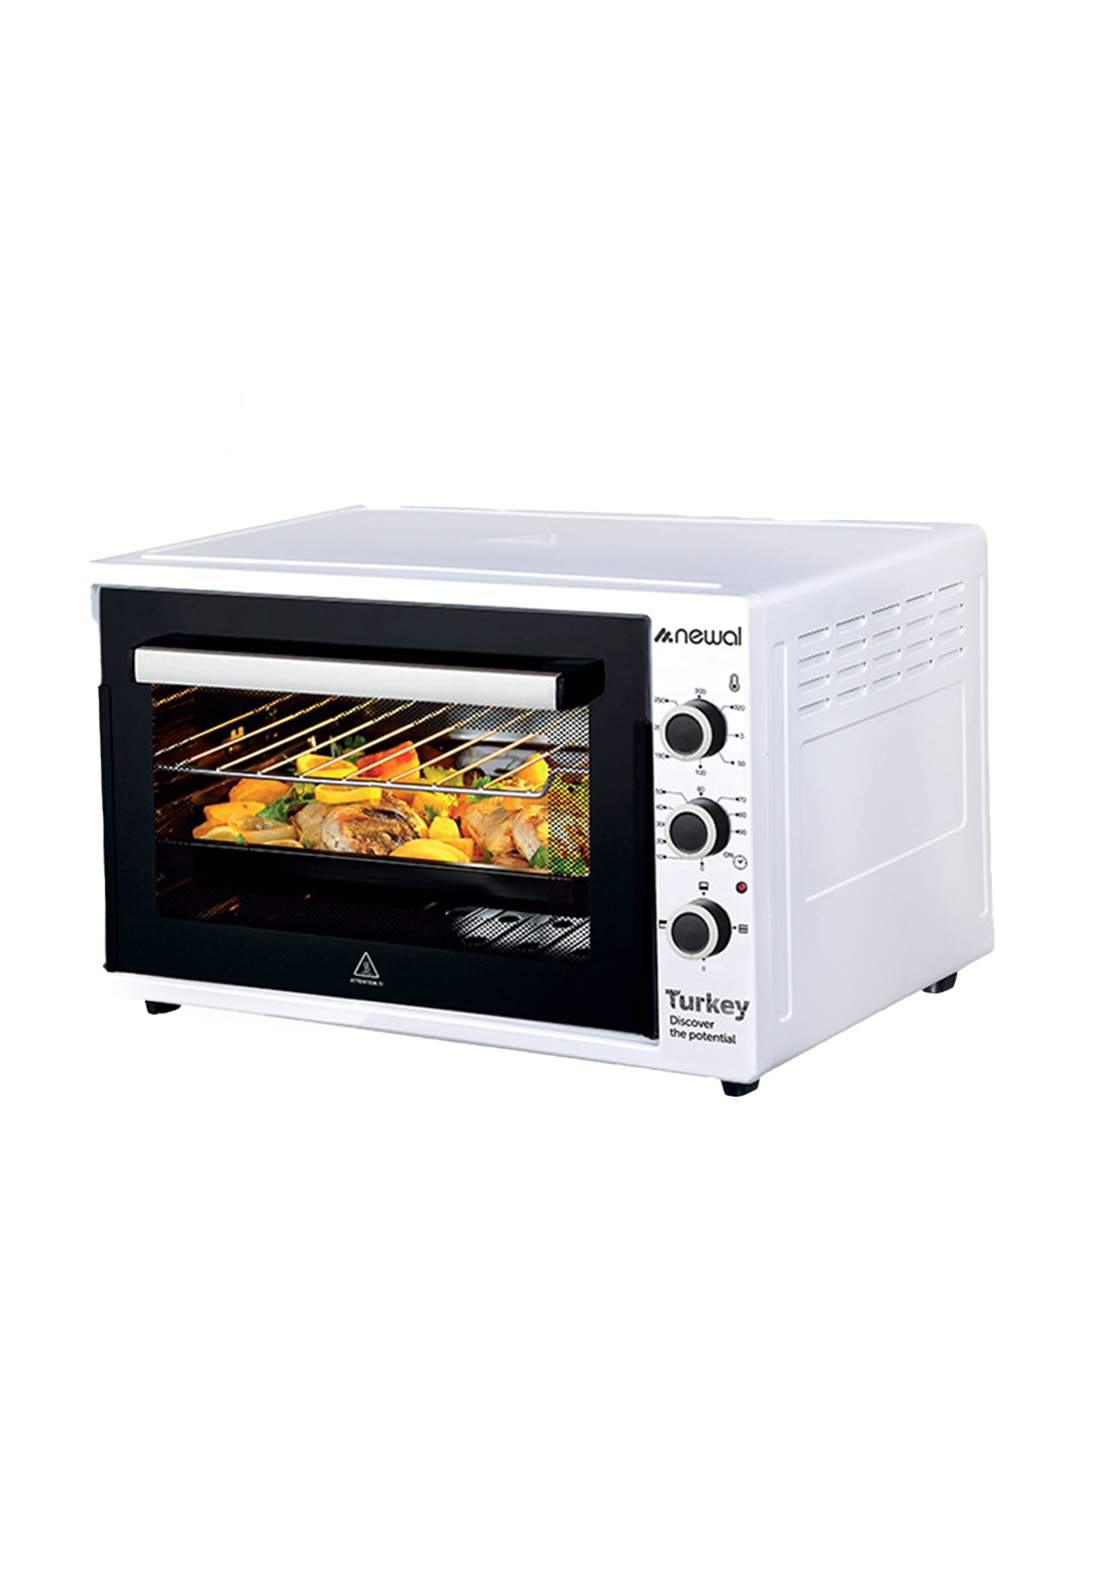 Newal Mini Oven 60L MOV-470-01 - White فرن كهربائي